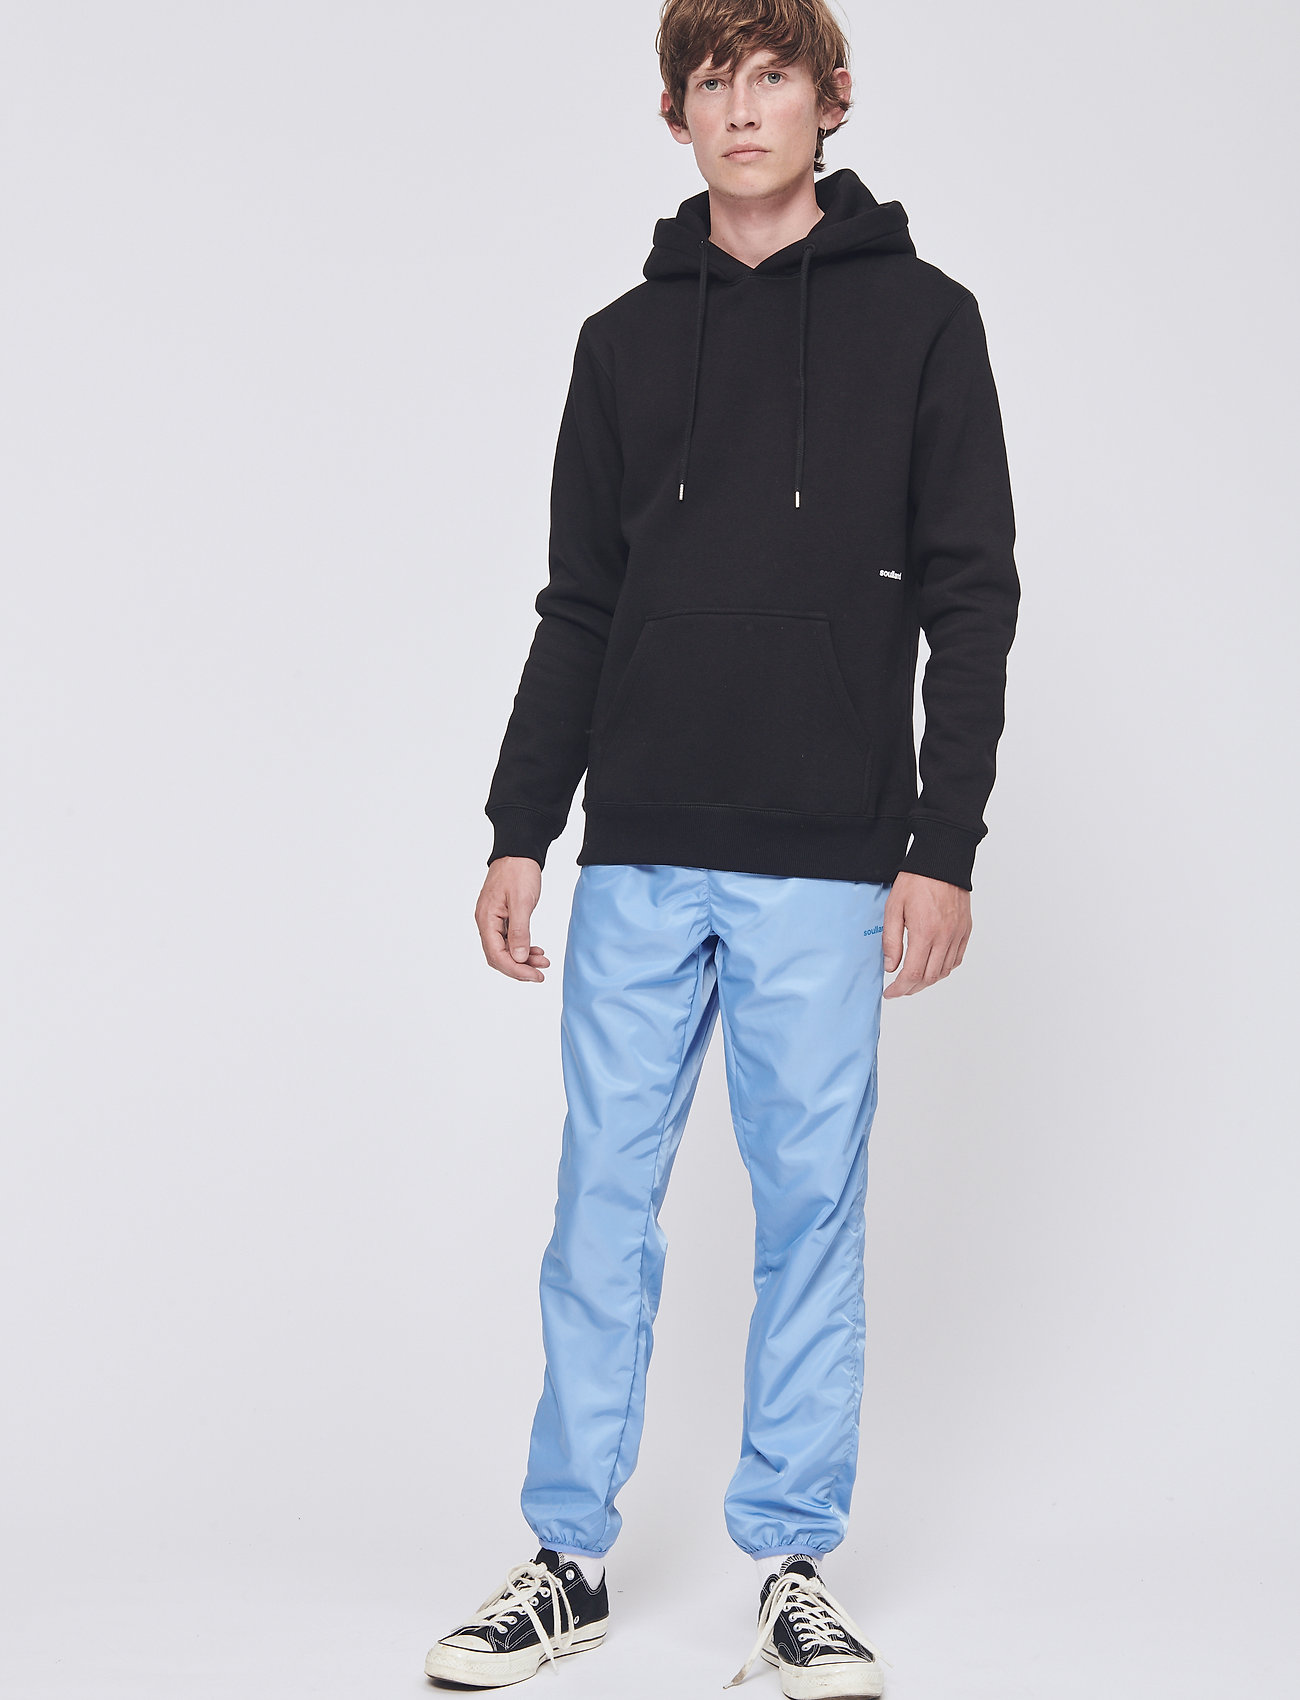 Soulland - LOGIC WALLANCE HOODED SWEAT W. FRONT PRINT - sweats basiques - black - 0